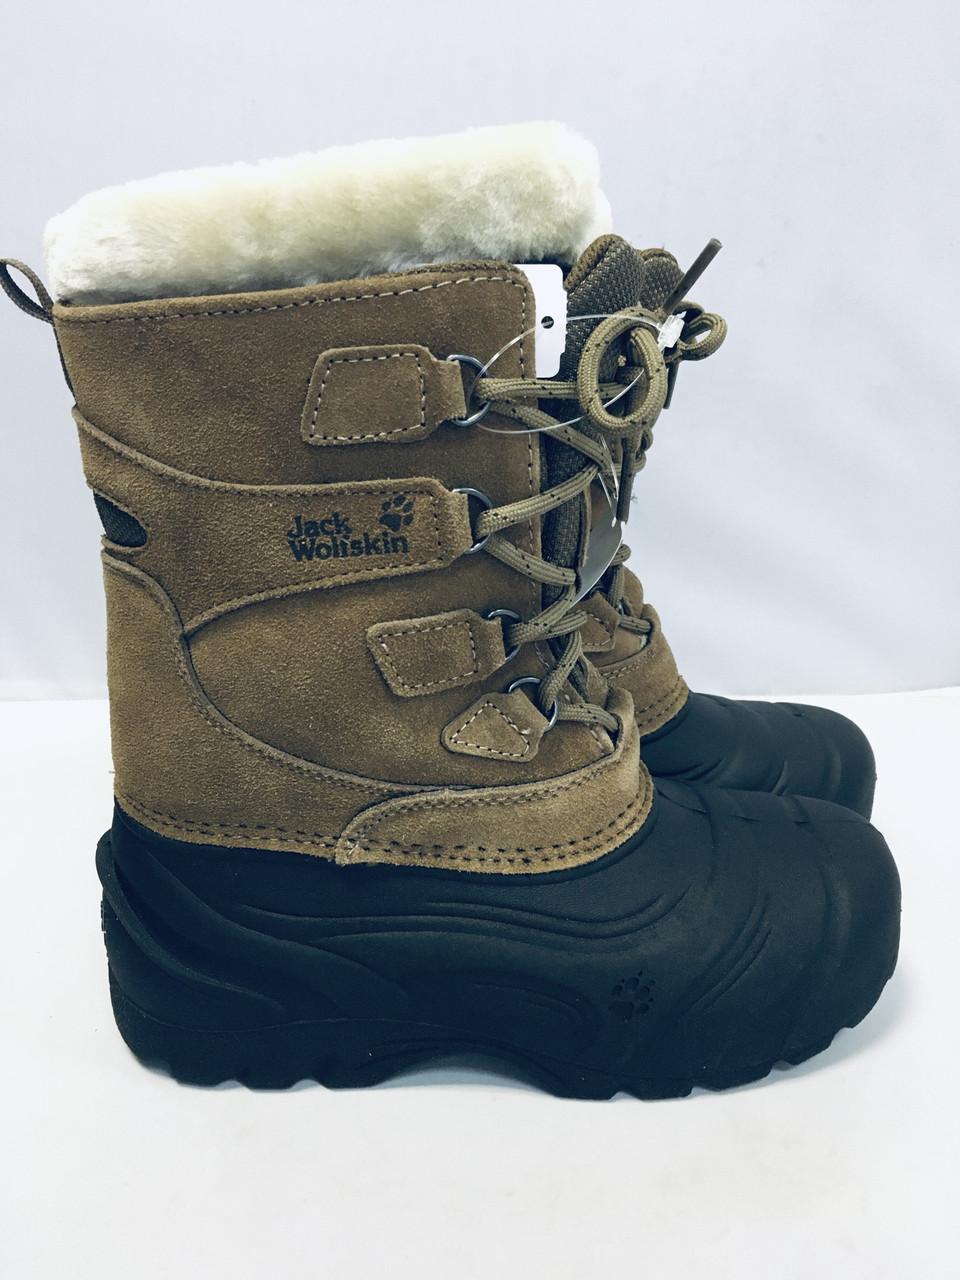 Зимние ботинки Jack Wolfskin, 31 размер